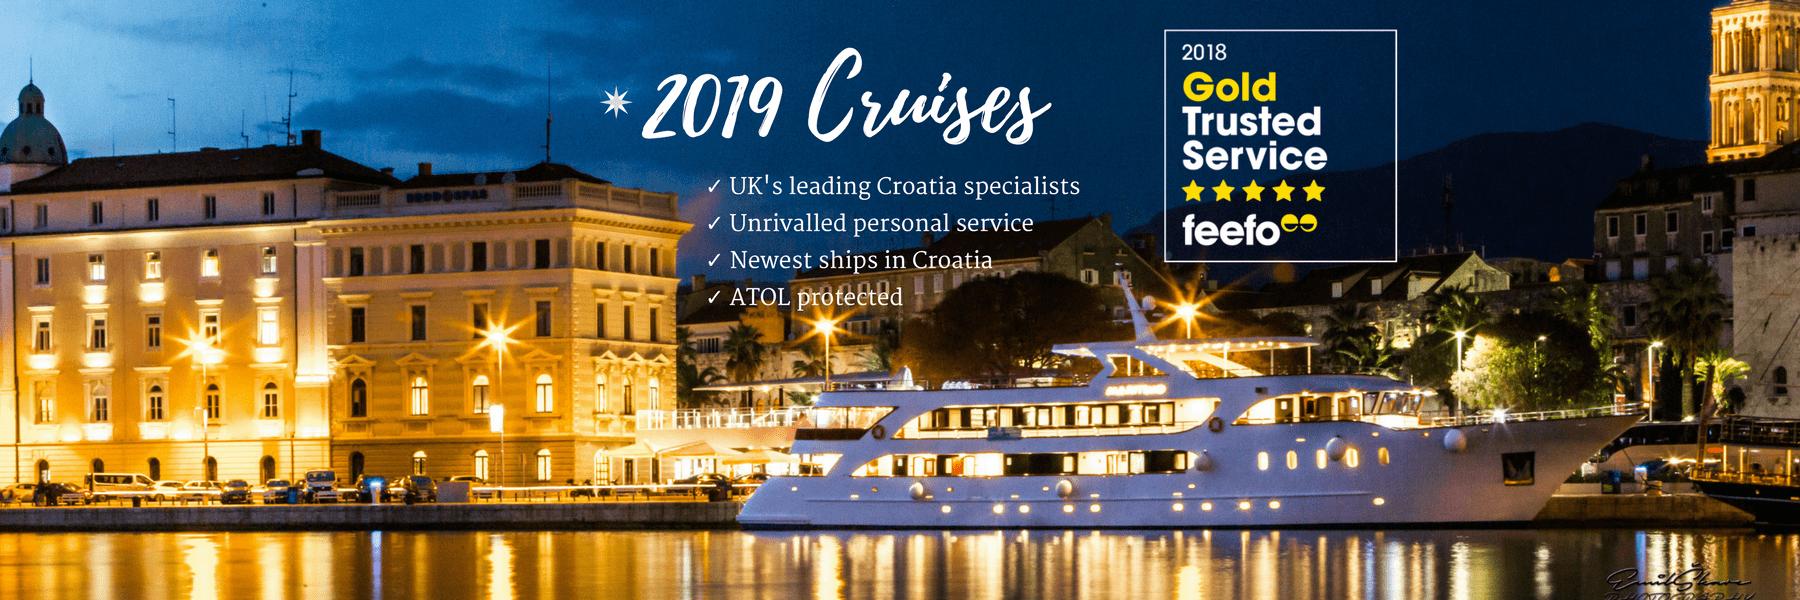 2019 Croatia Cruises